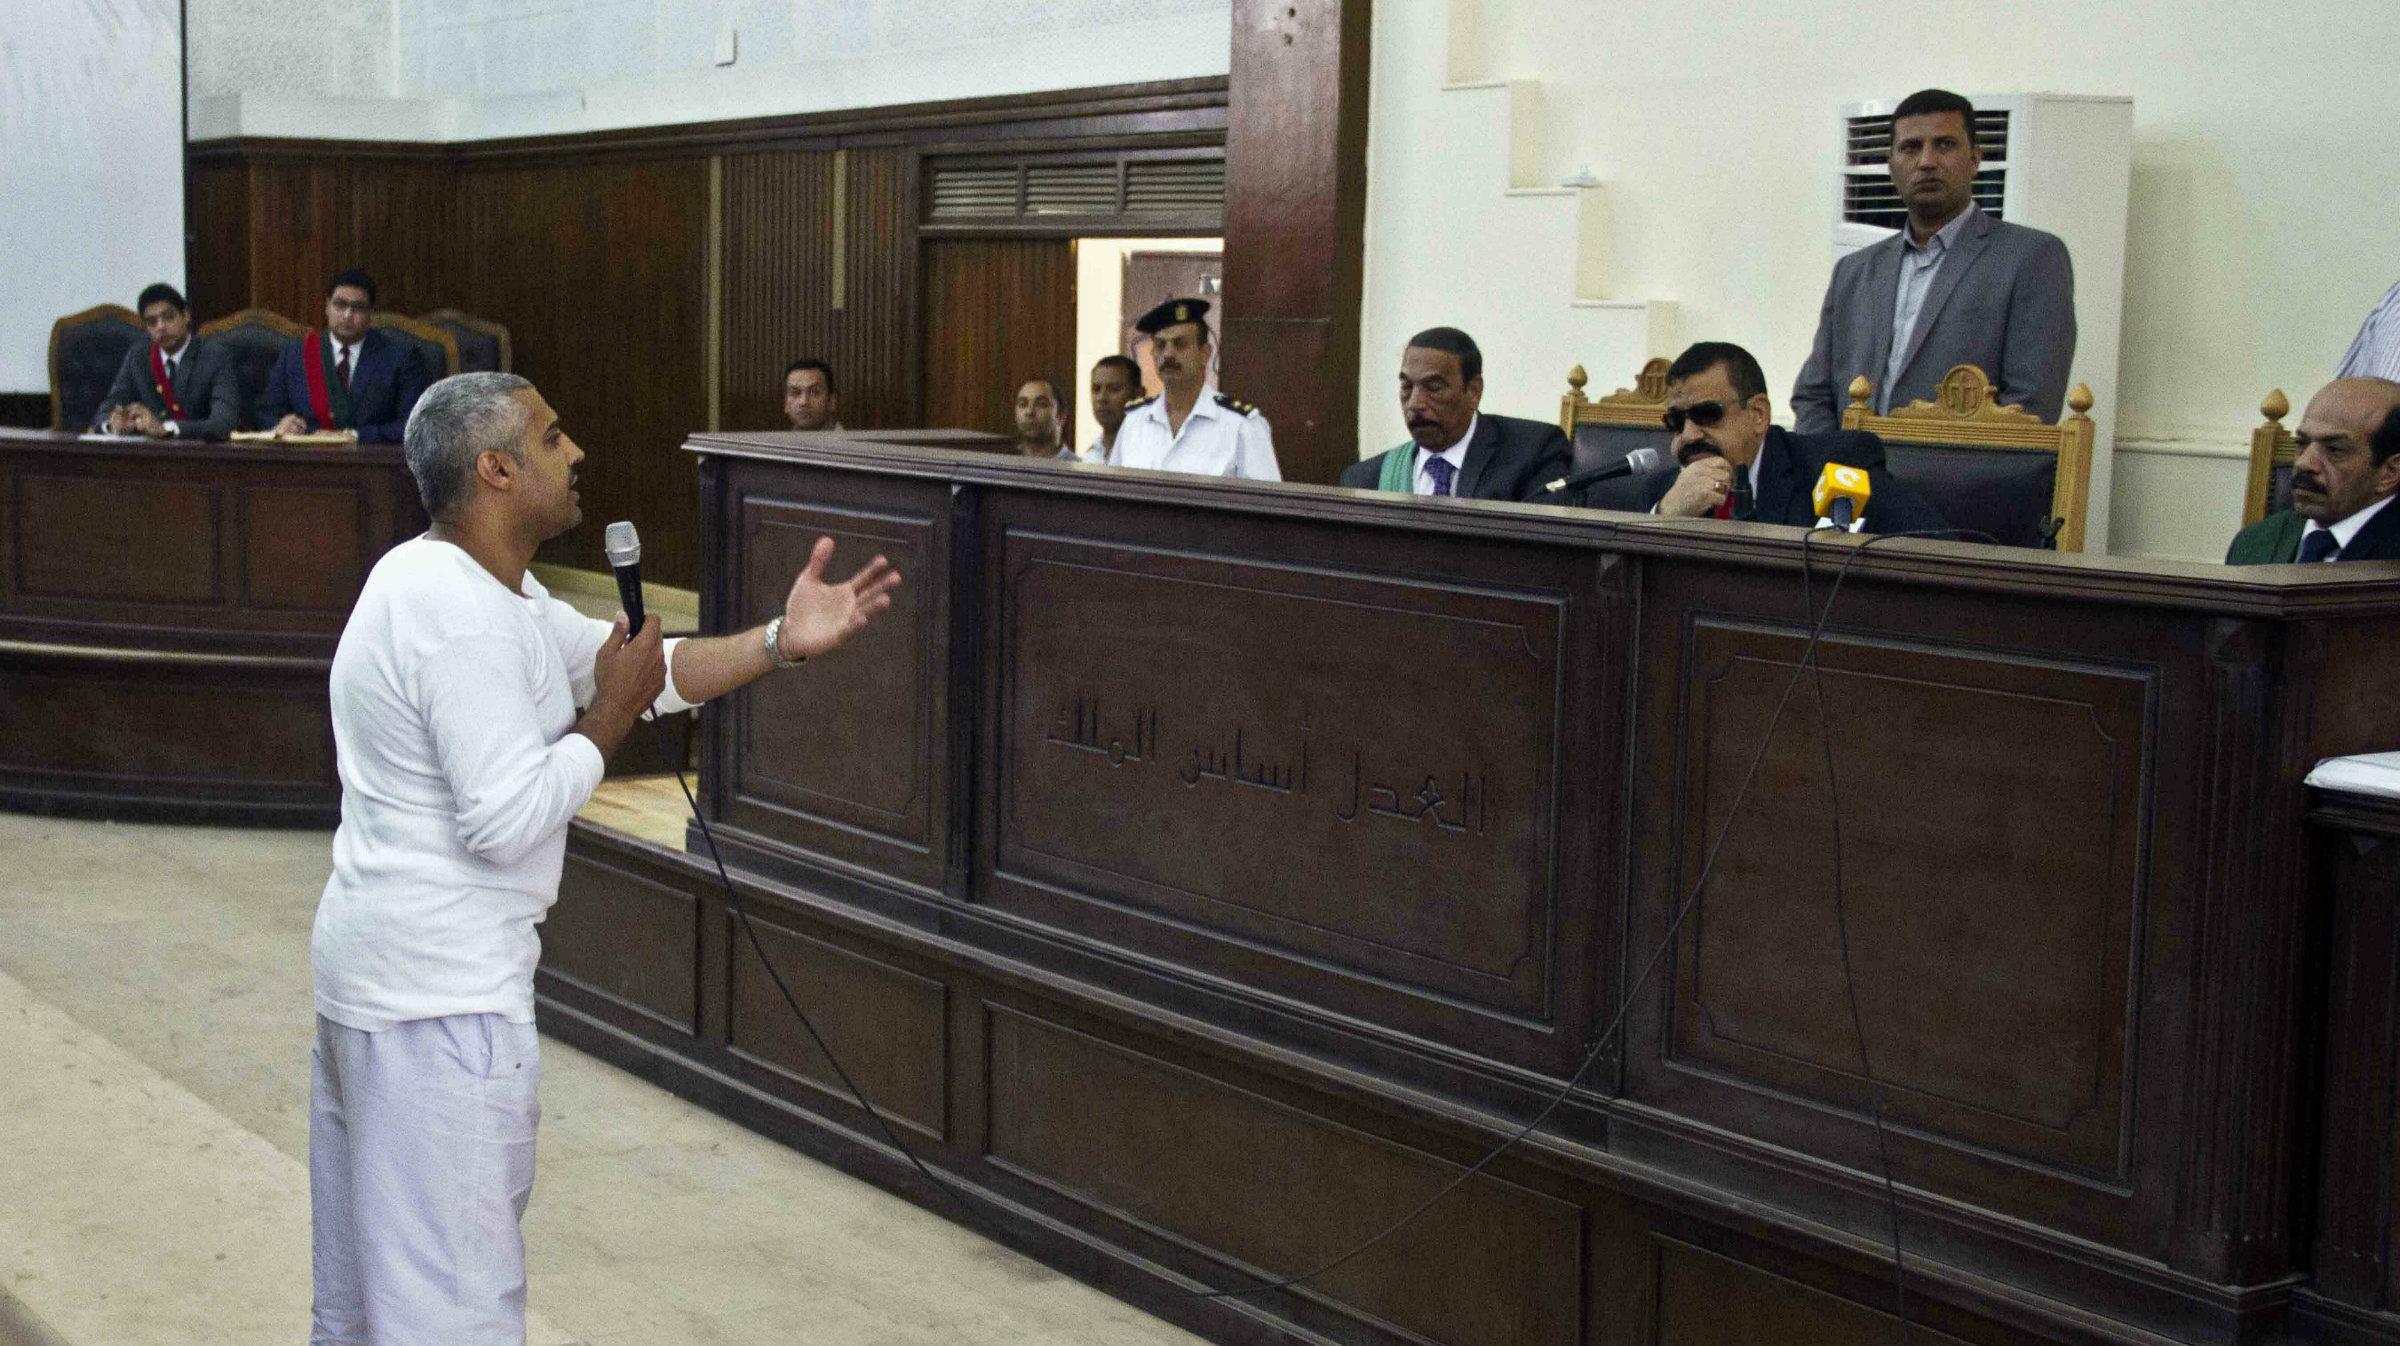 Al Jazeera journalists on trial.